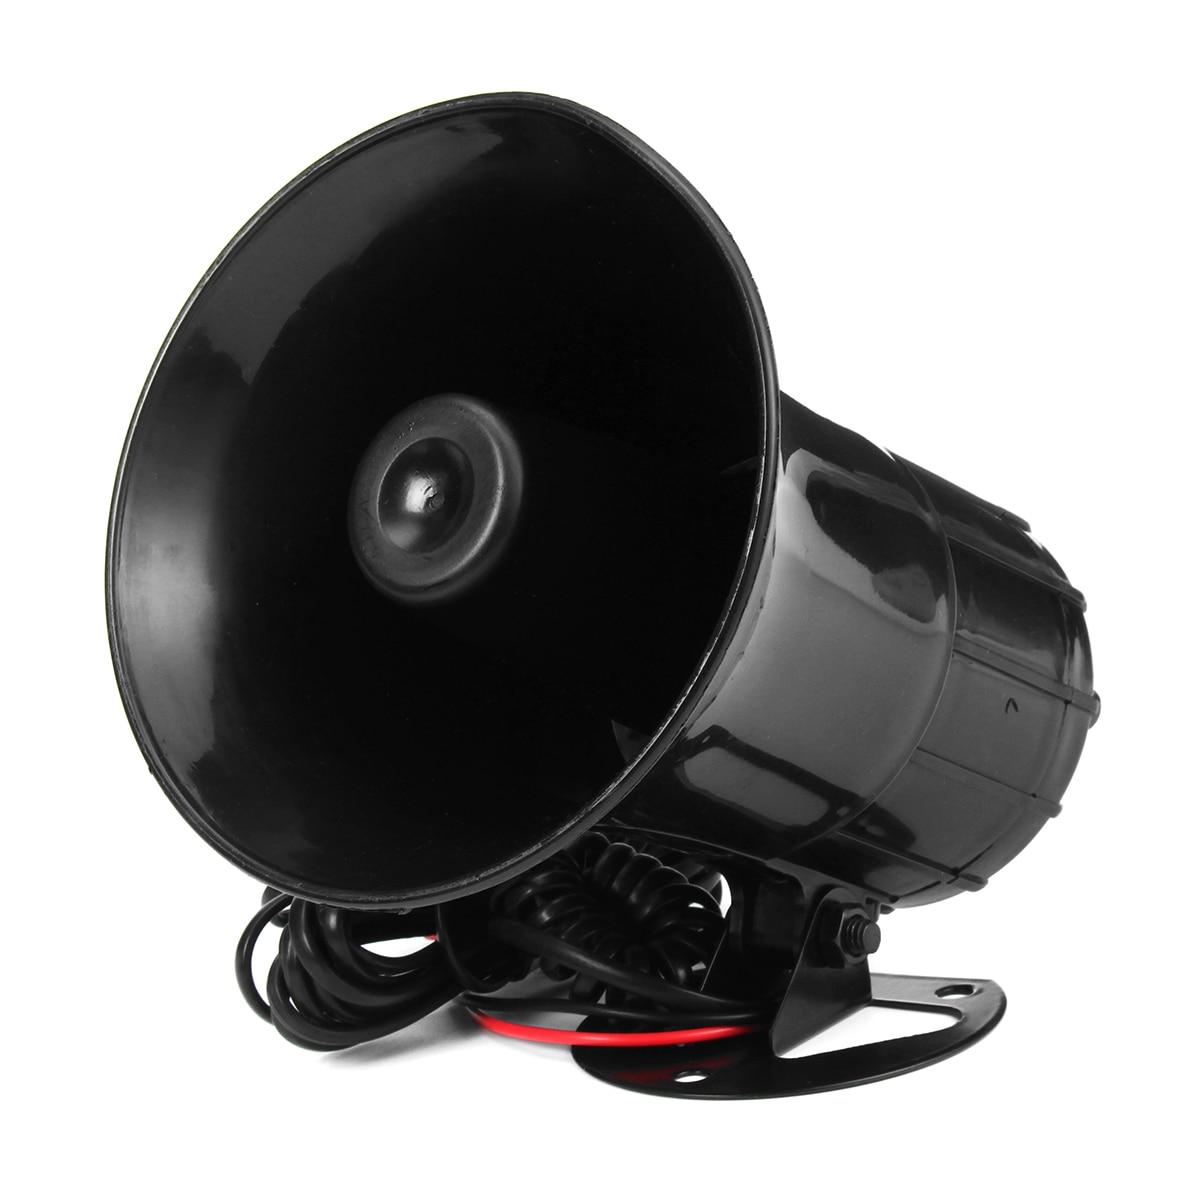 7 Sound 12V Universal Car Alarm Loud Horn Warning Alarm police Fire Siren Car Alarm Loud Speaker 30W/50W/100W